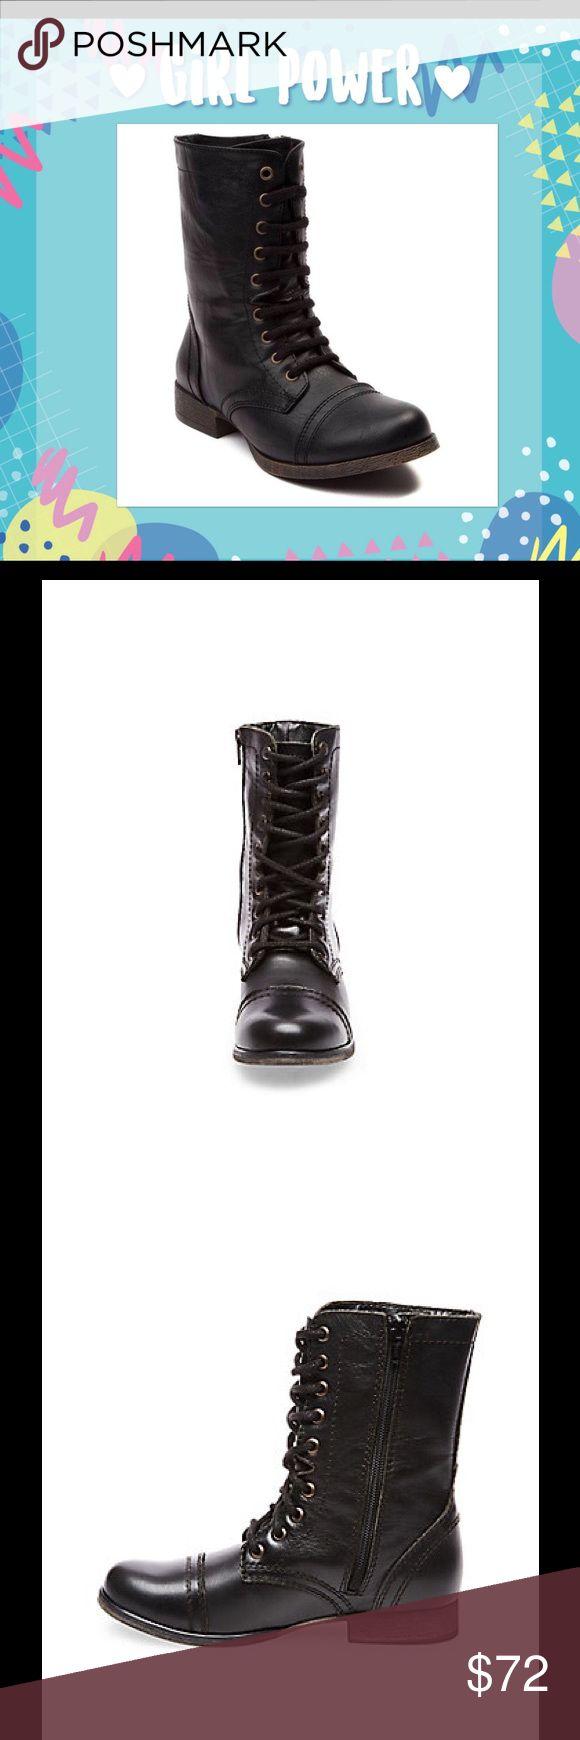 25 best ideas about cute combat boots on pinterest